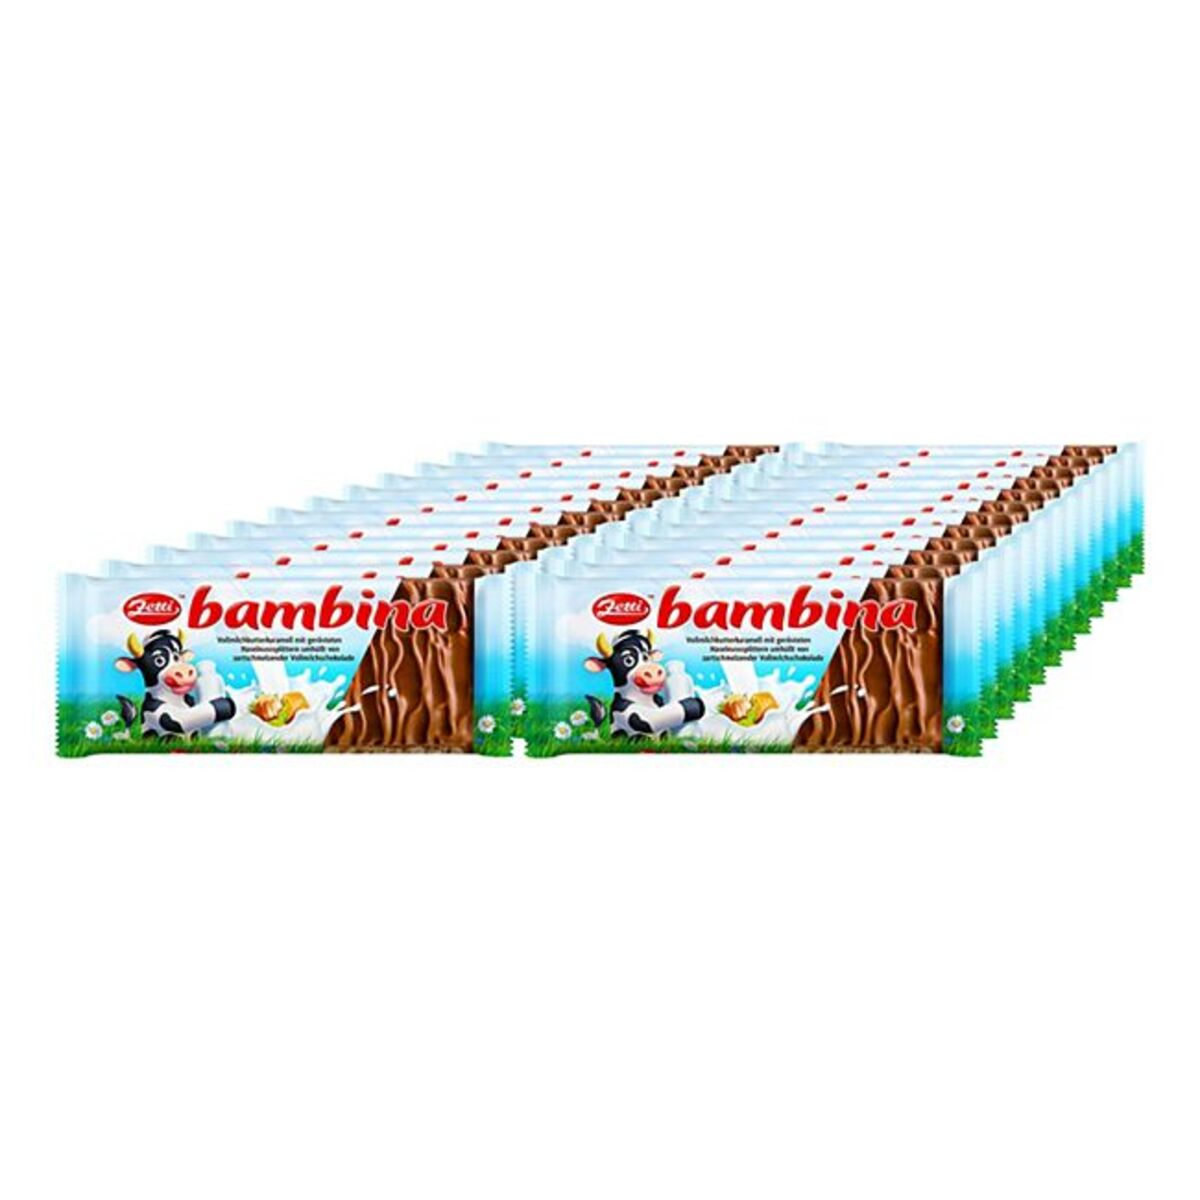 Bild 1 von Zetti Bambina Schokolade 100 g, 24er Pack